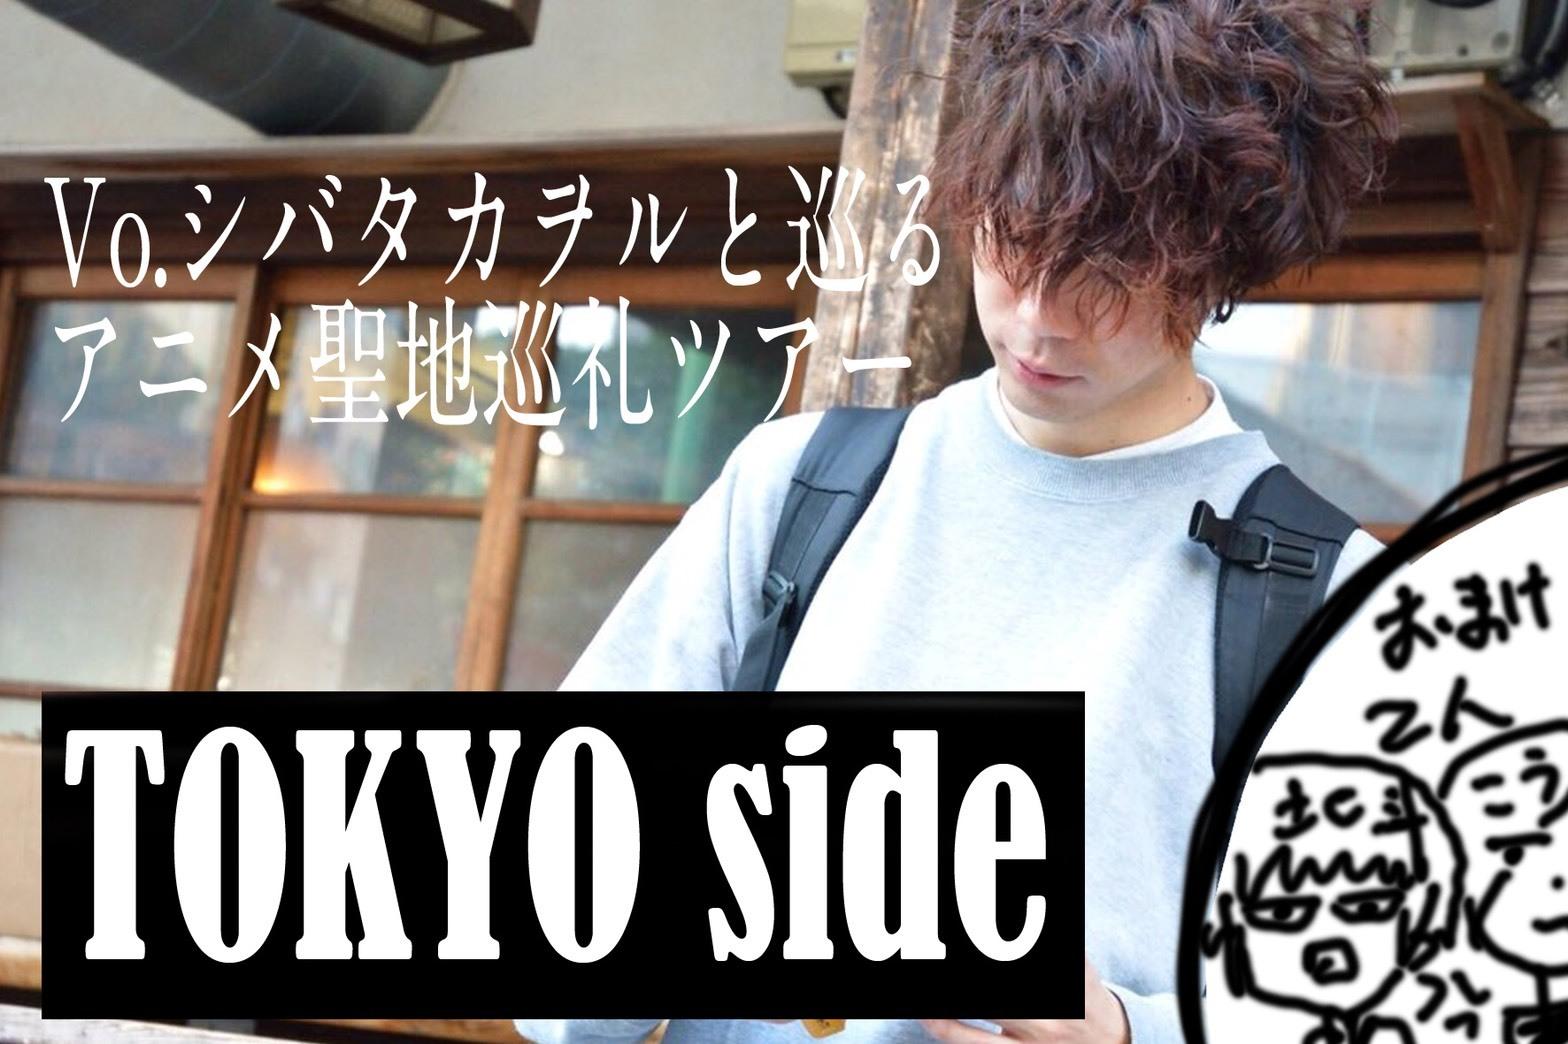 <Vo.シバタカヲルと巡るアニメ聖地巡礼ツアー(東京編)>